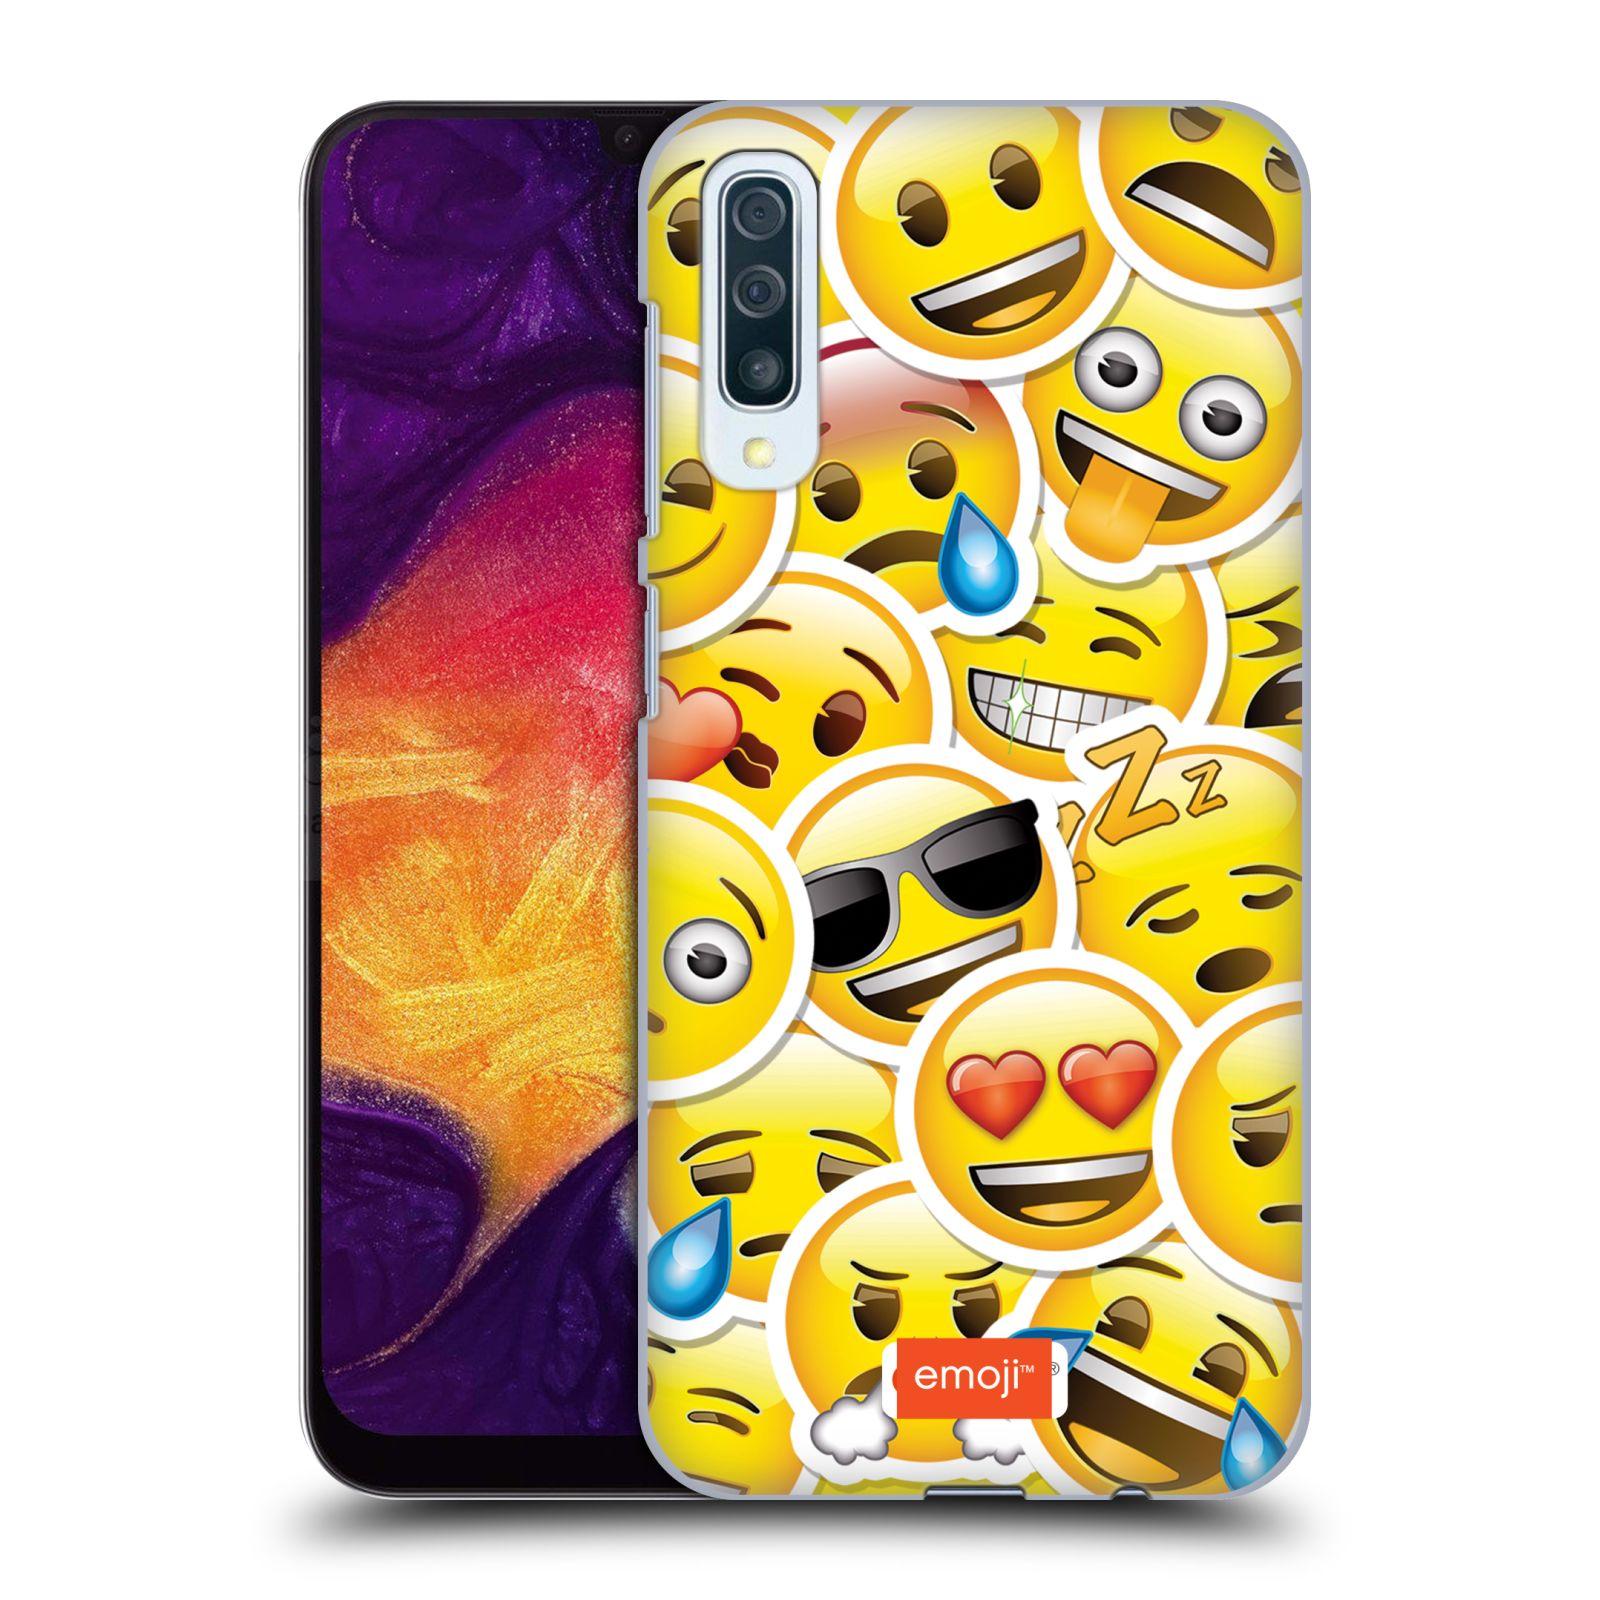 Plastové pouzdro na mobil Samsung Galaxy A50 / A30s - Head Case - EMOJI - Velcí smajlíci ZZ